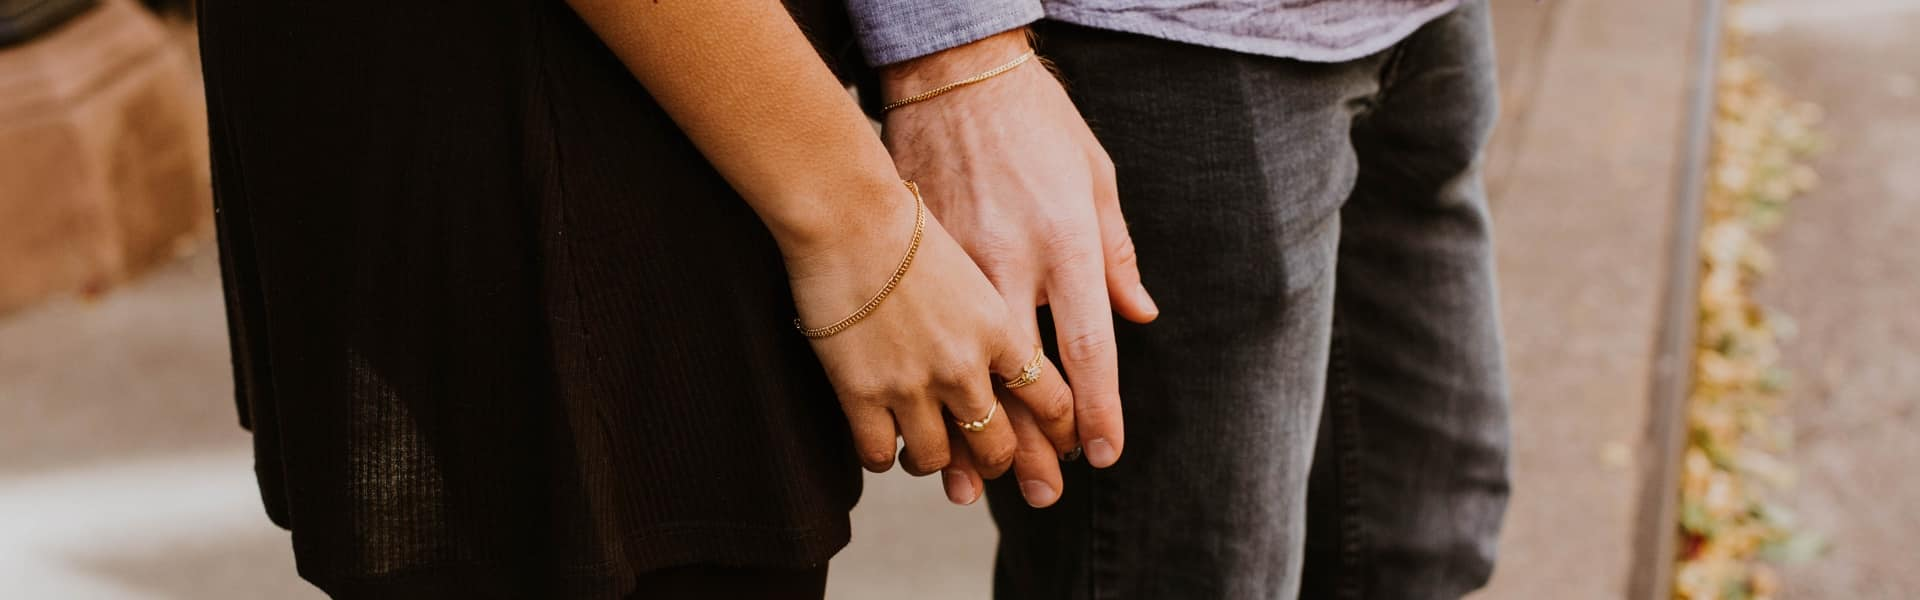 Couple qui essaie de ne pas se séparer